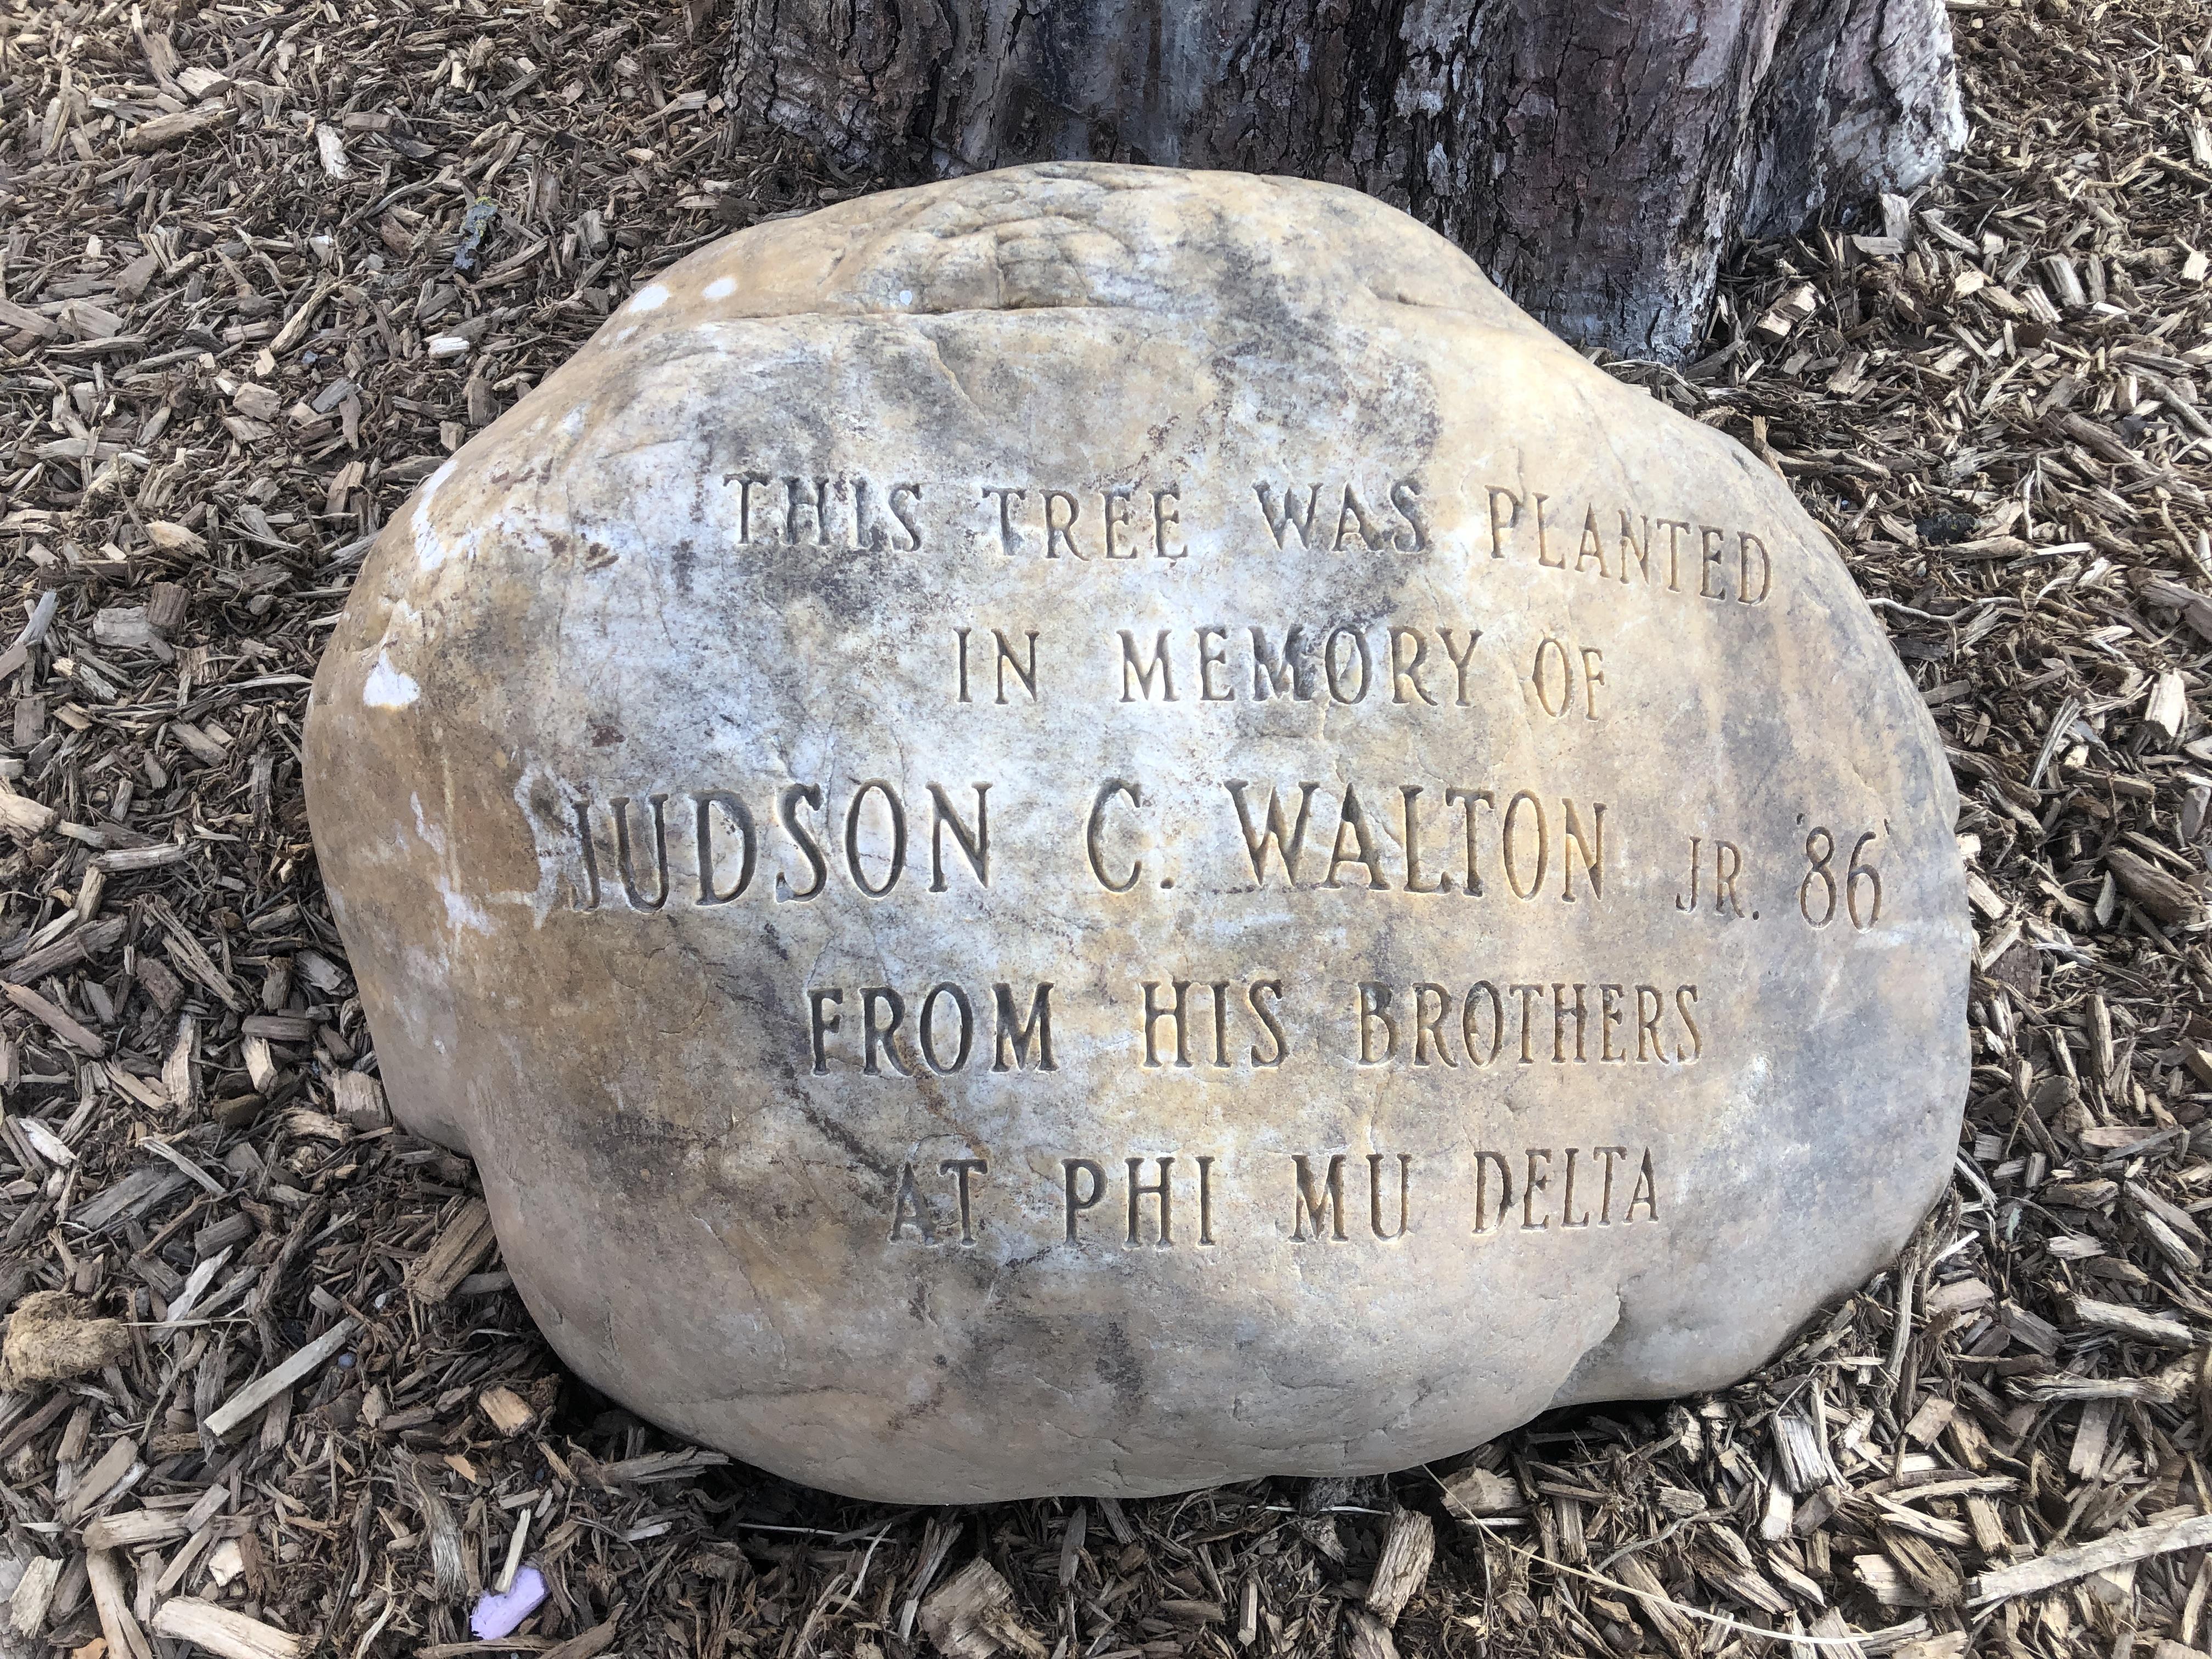 Judson C. Walton Jr. Marker